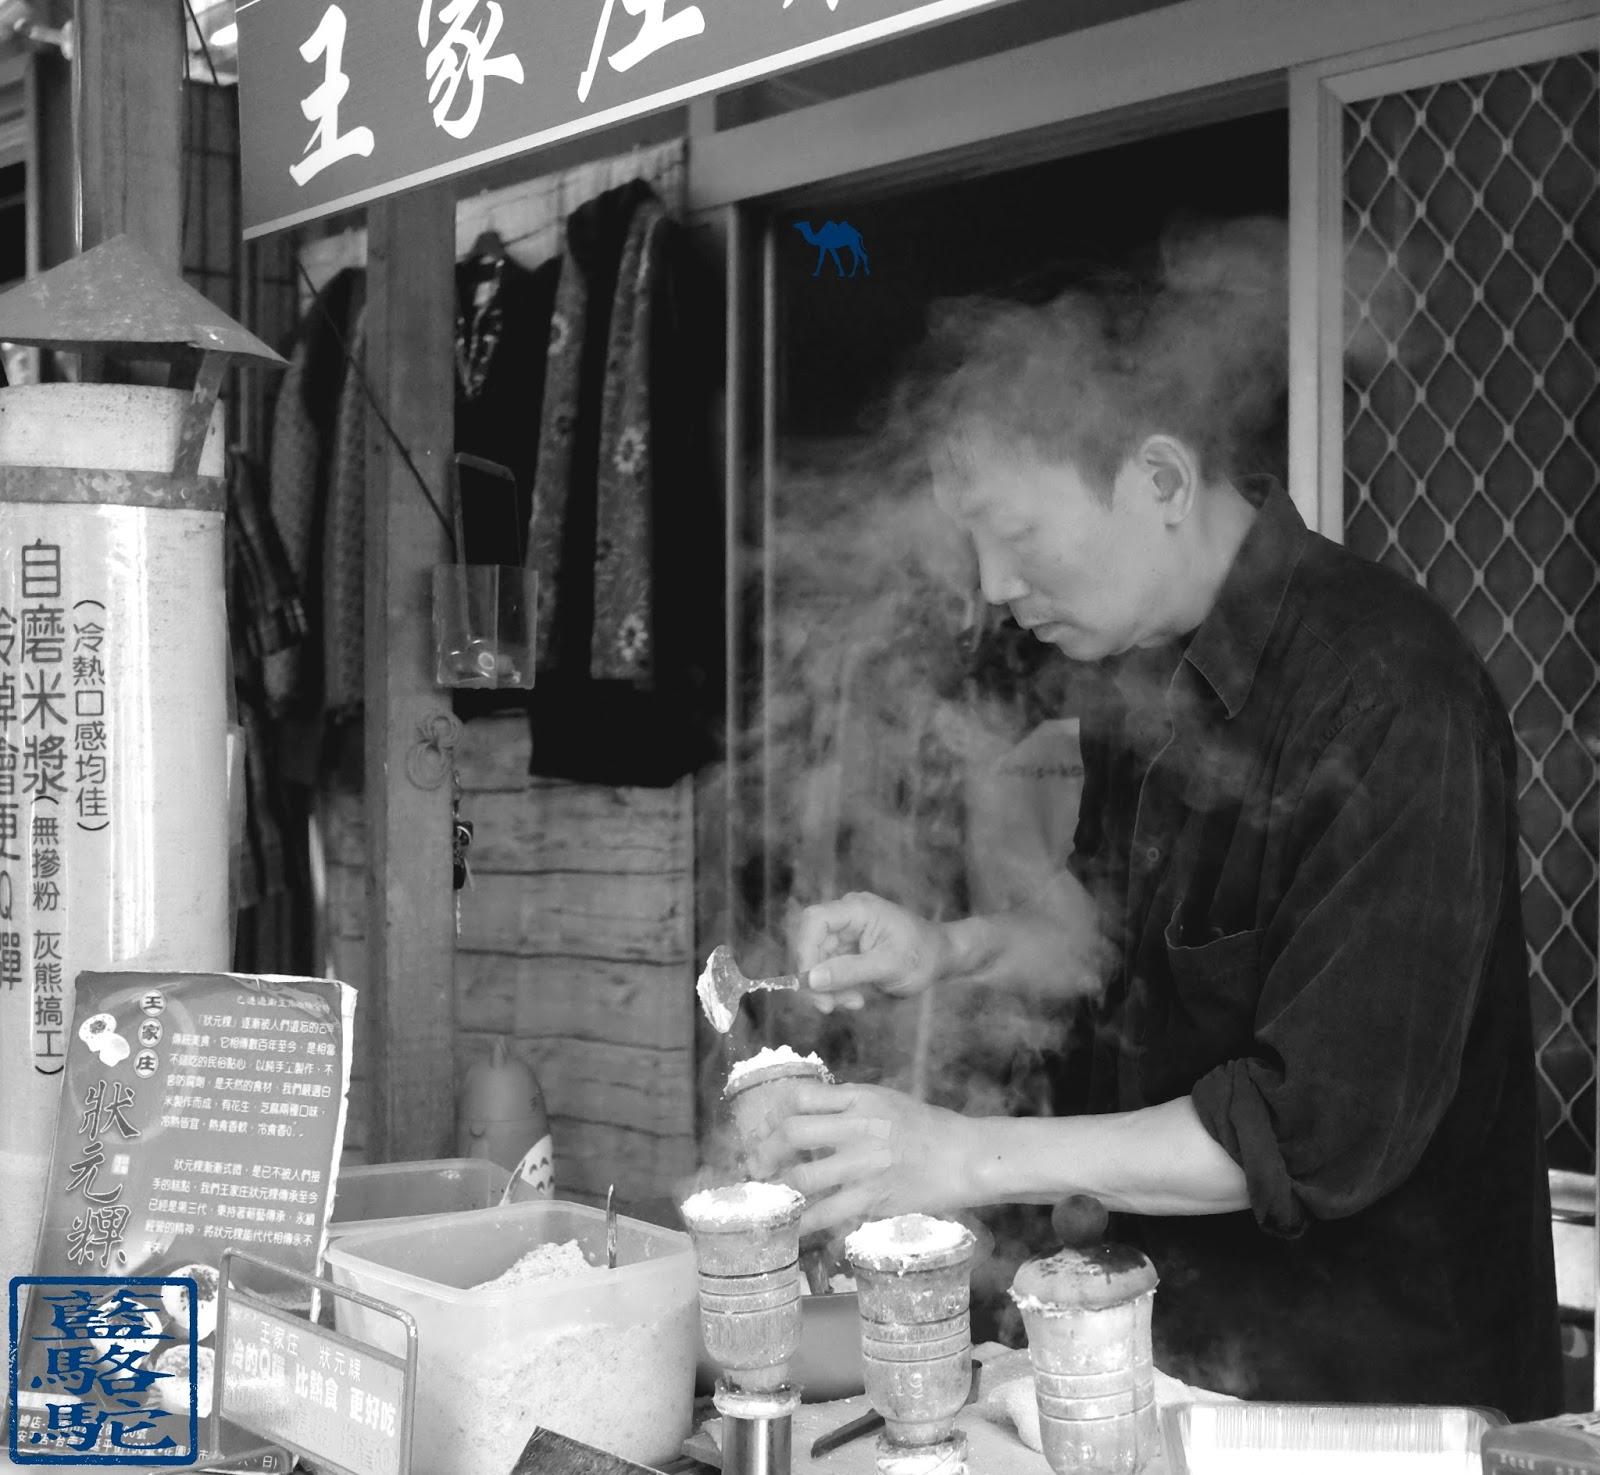 Le Chameau Bleu - Streetfood à Tainan Ile de formose Taiwan - vacances taiwan